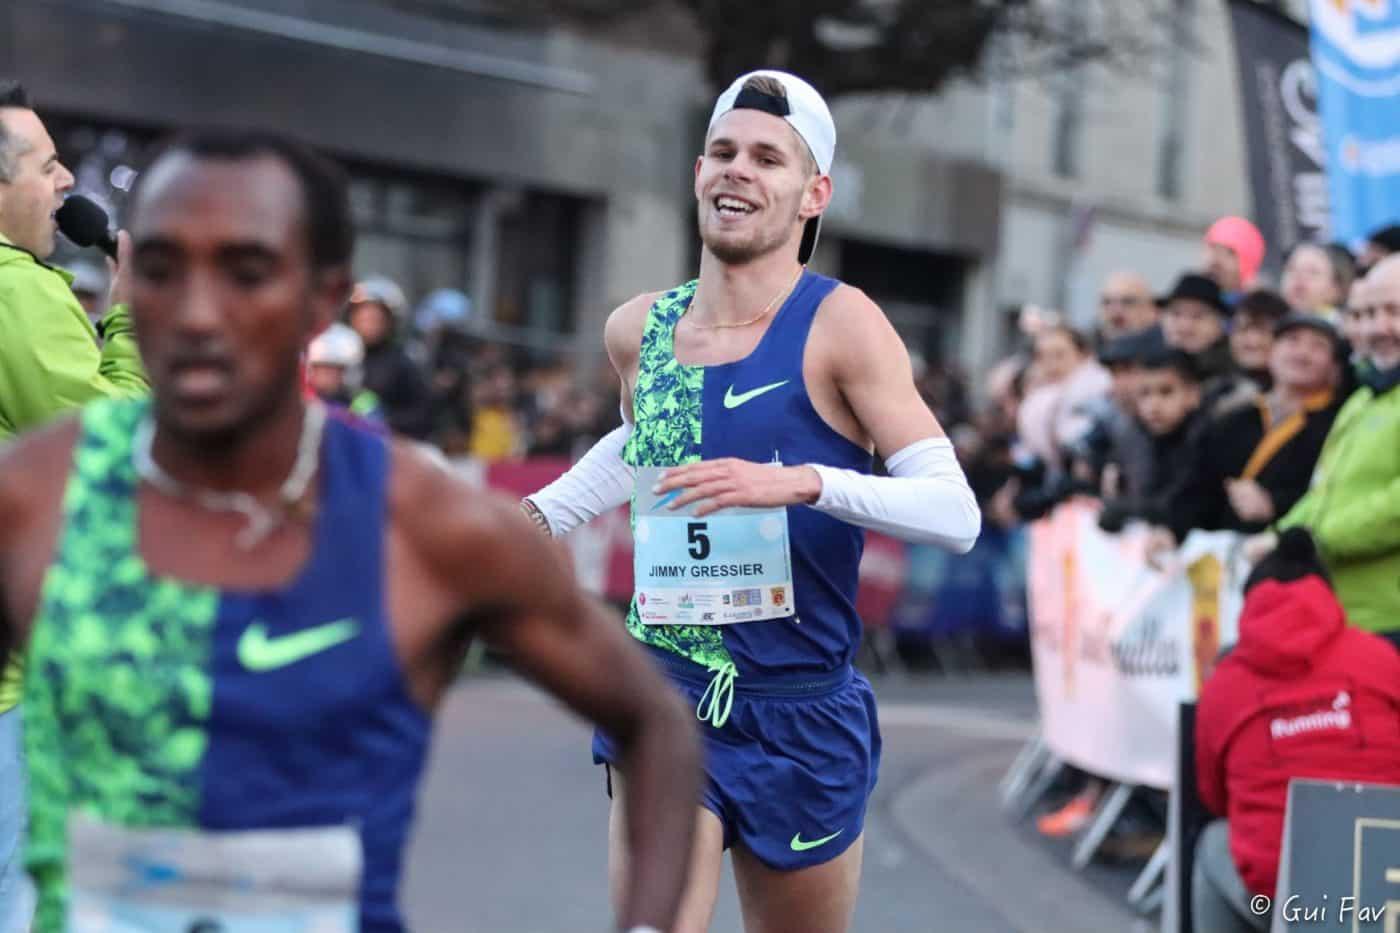 Jimmy-Gressier-Corrida-Houilles-Record-Runpack